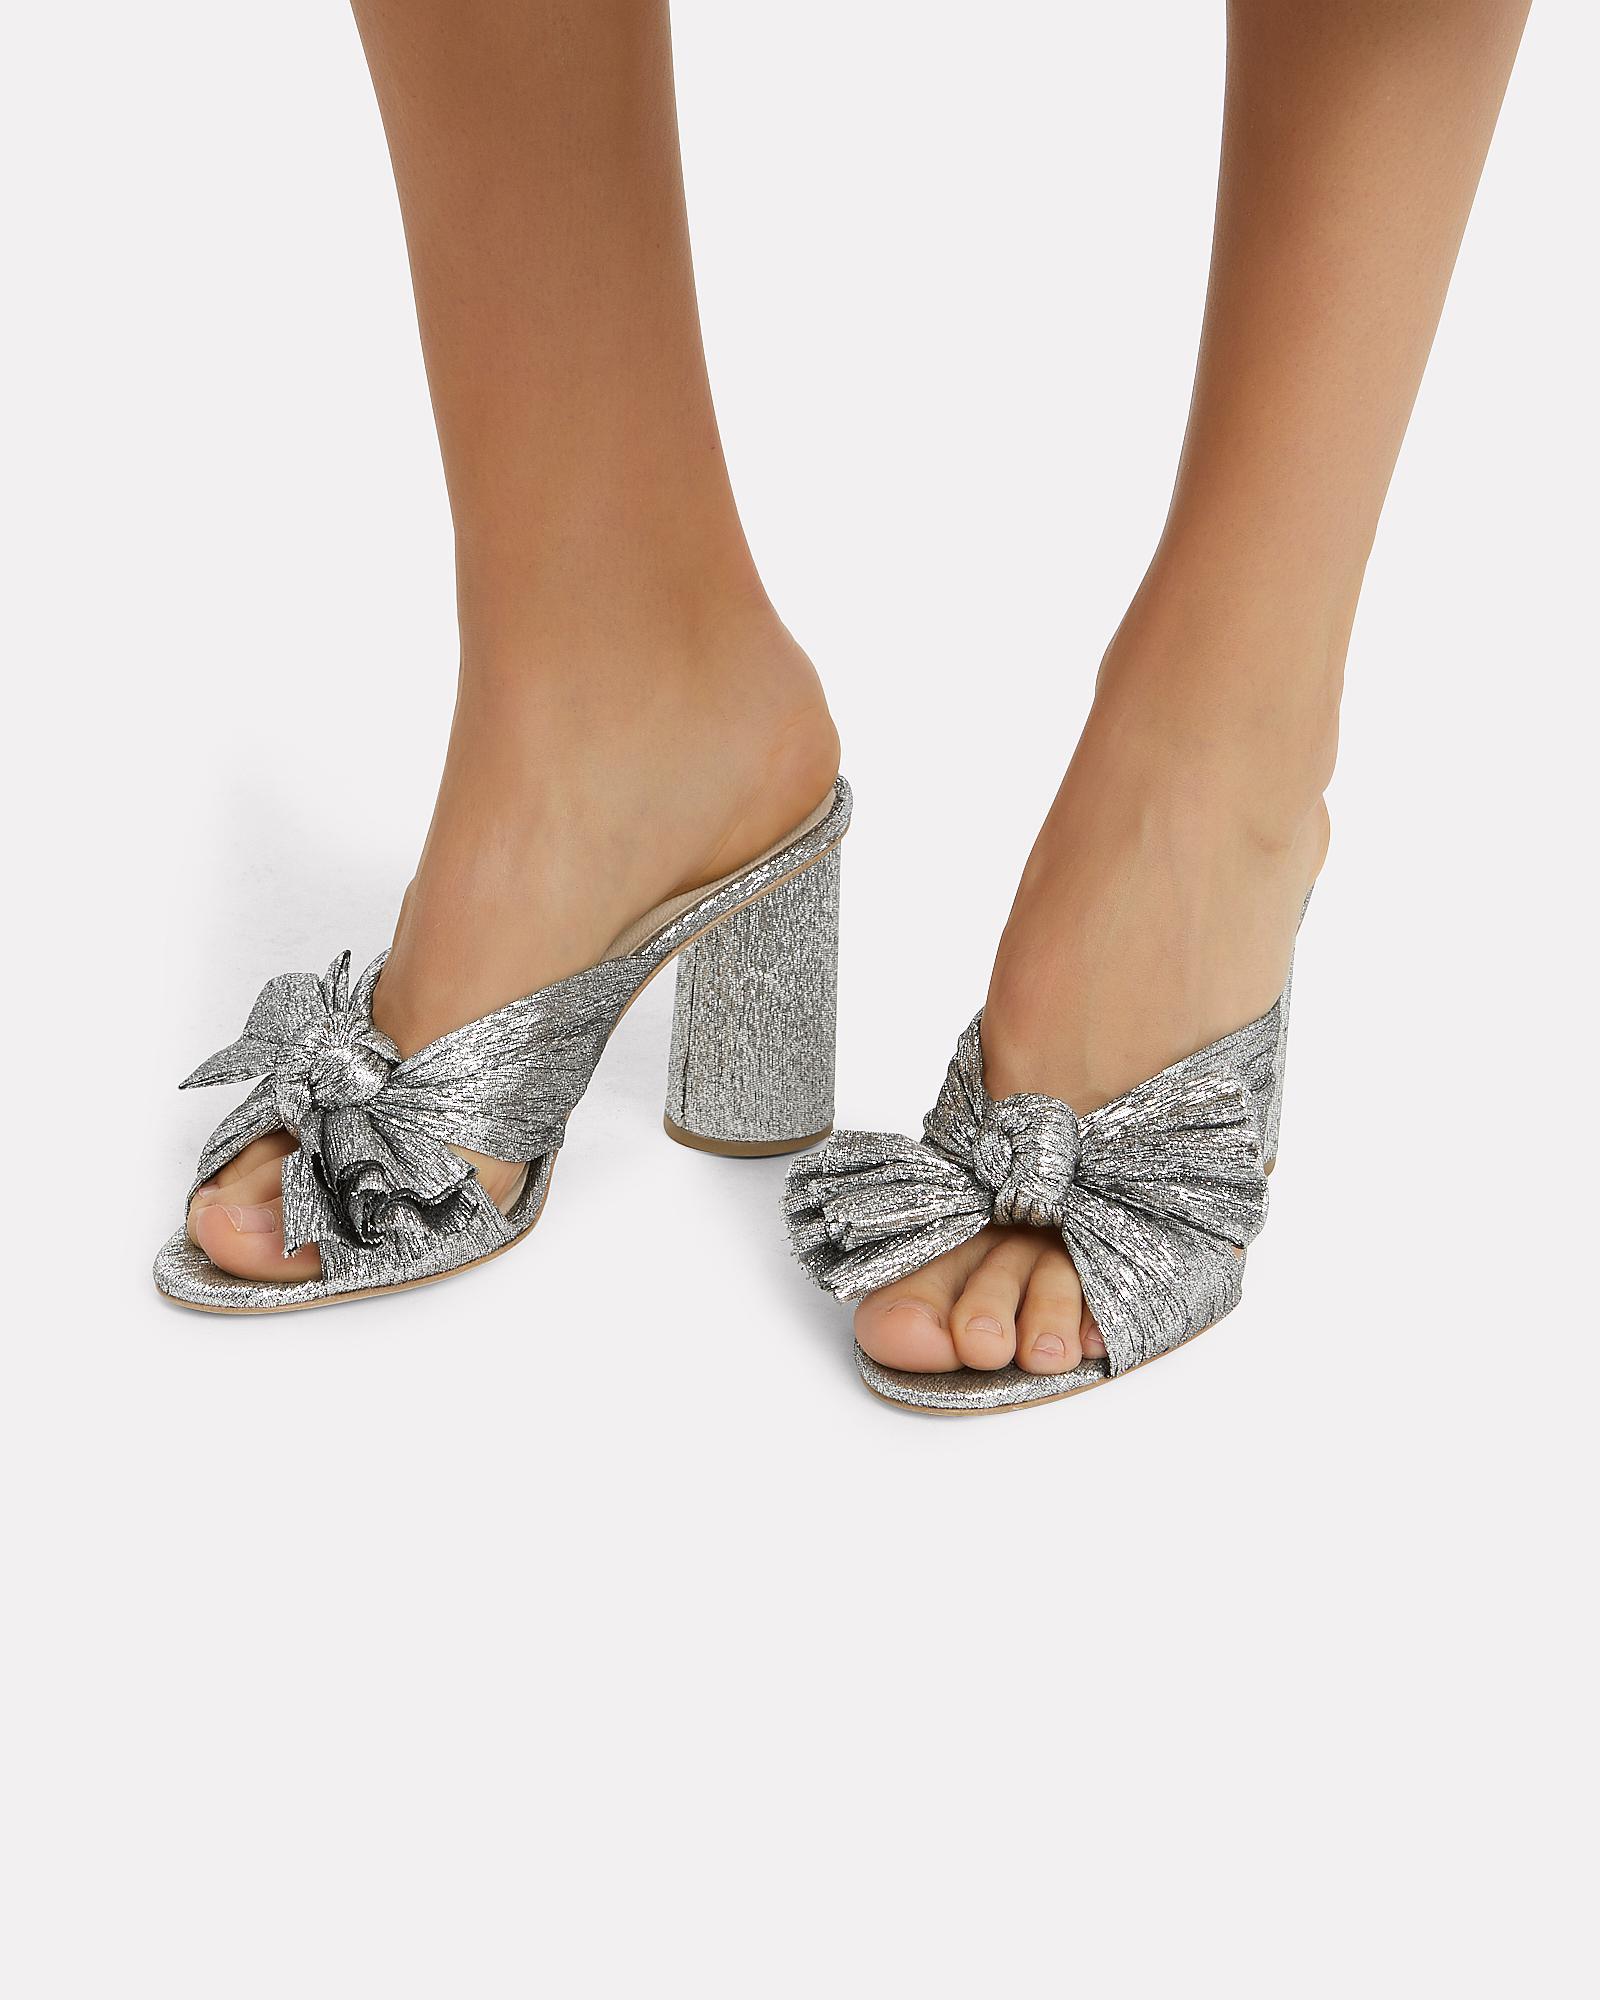 d9eee740889 Lyst - Loeffler Randall Penny Knot Strap Slide Sandals in Metallic